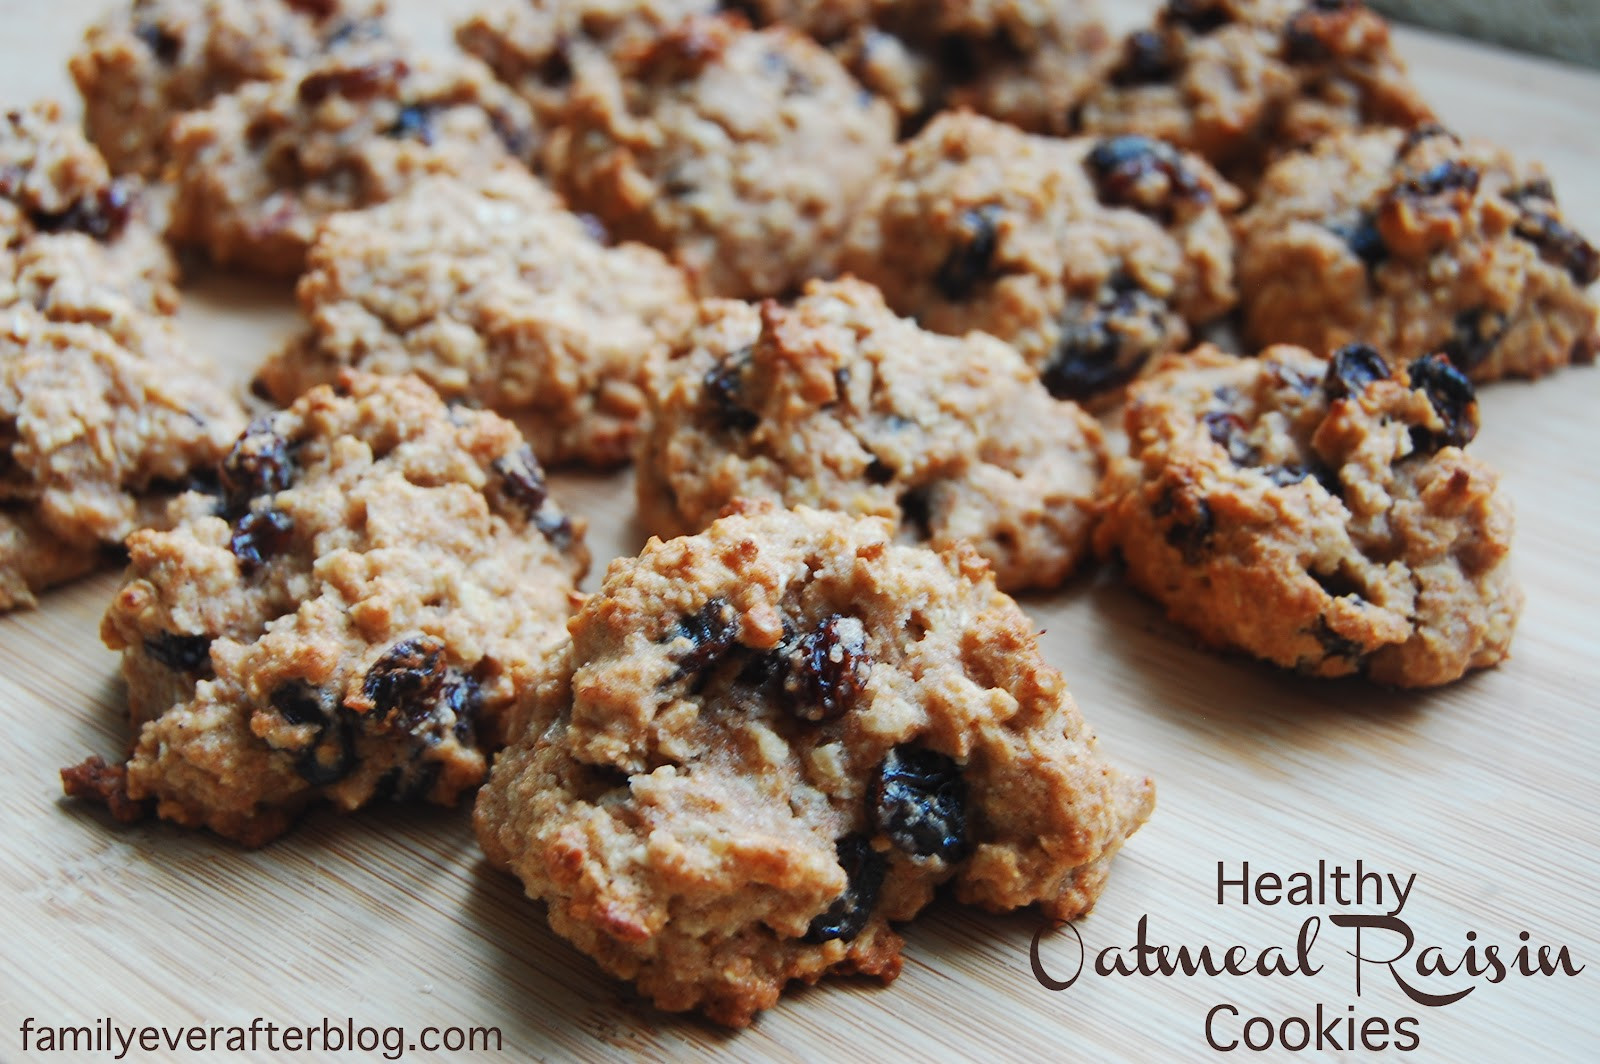 Healthy Oatmeal Raisin Cookies Applesauce  Healthy Oatmeal Raisin Cookies